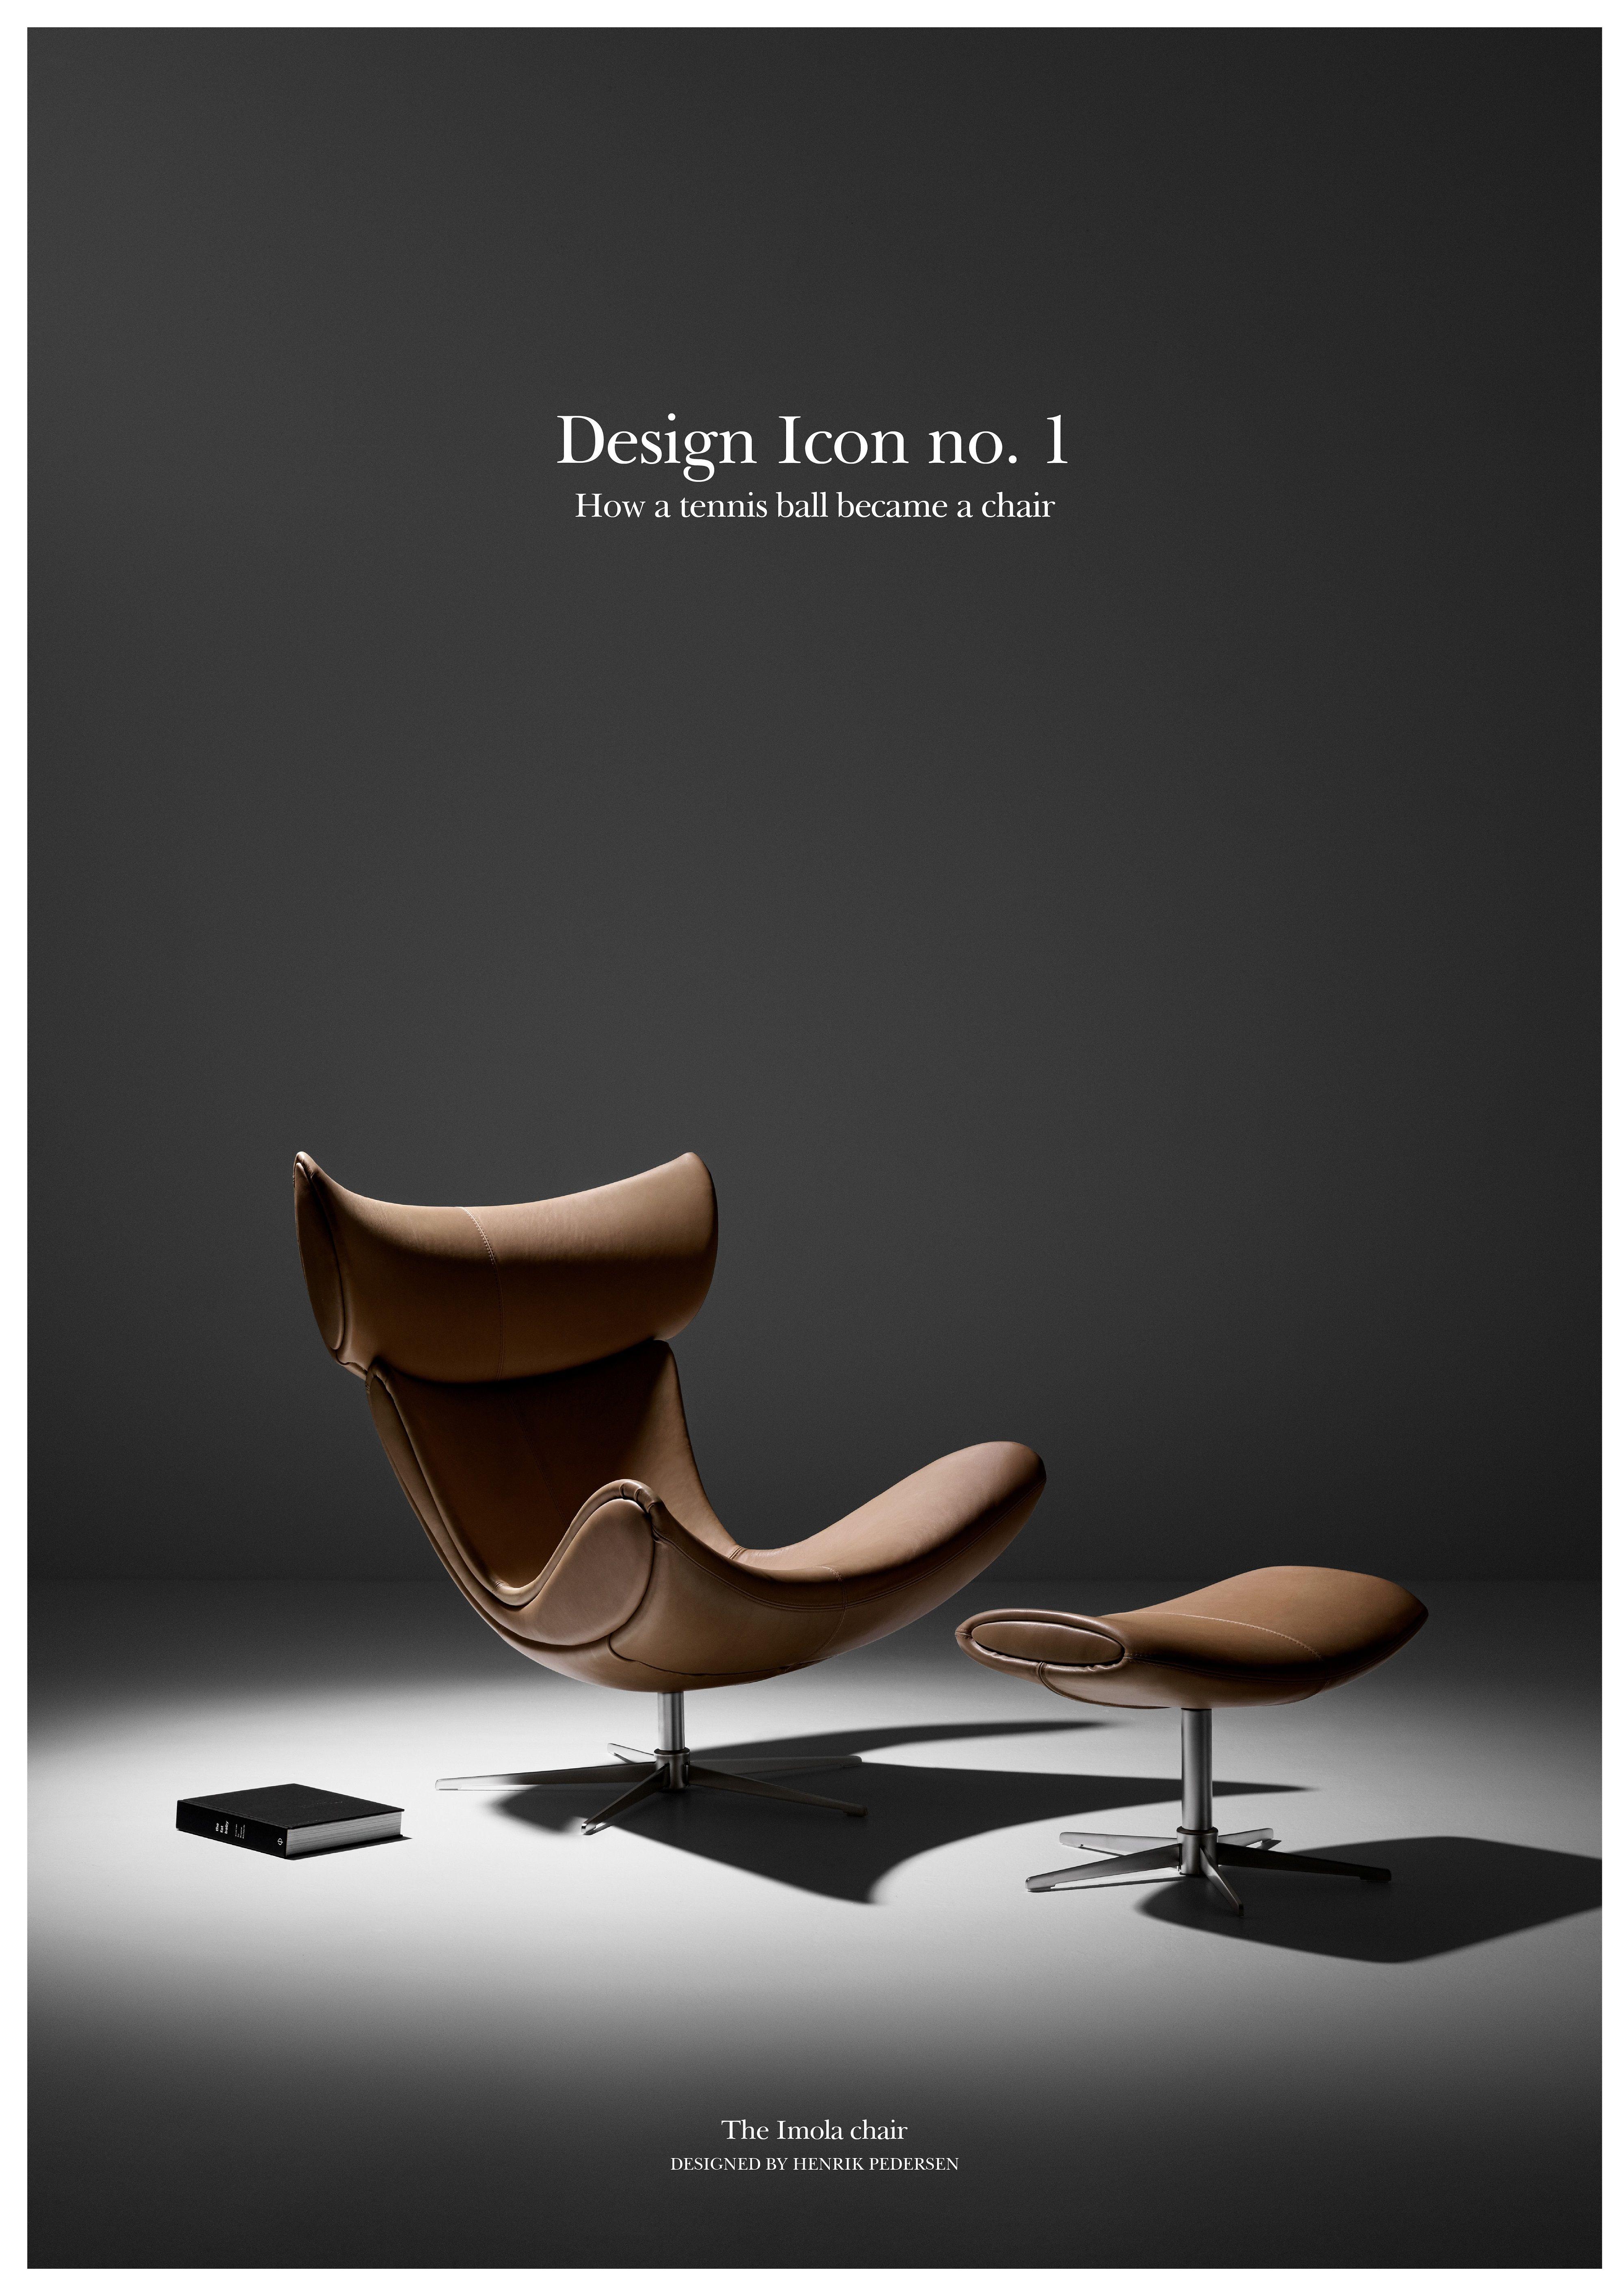 boconcept 2016 collection design icon no 1 boconcept boconcept 2016 collection pinterest. Black Bedroom Furniture Sets. Home Design Ideas